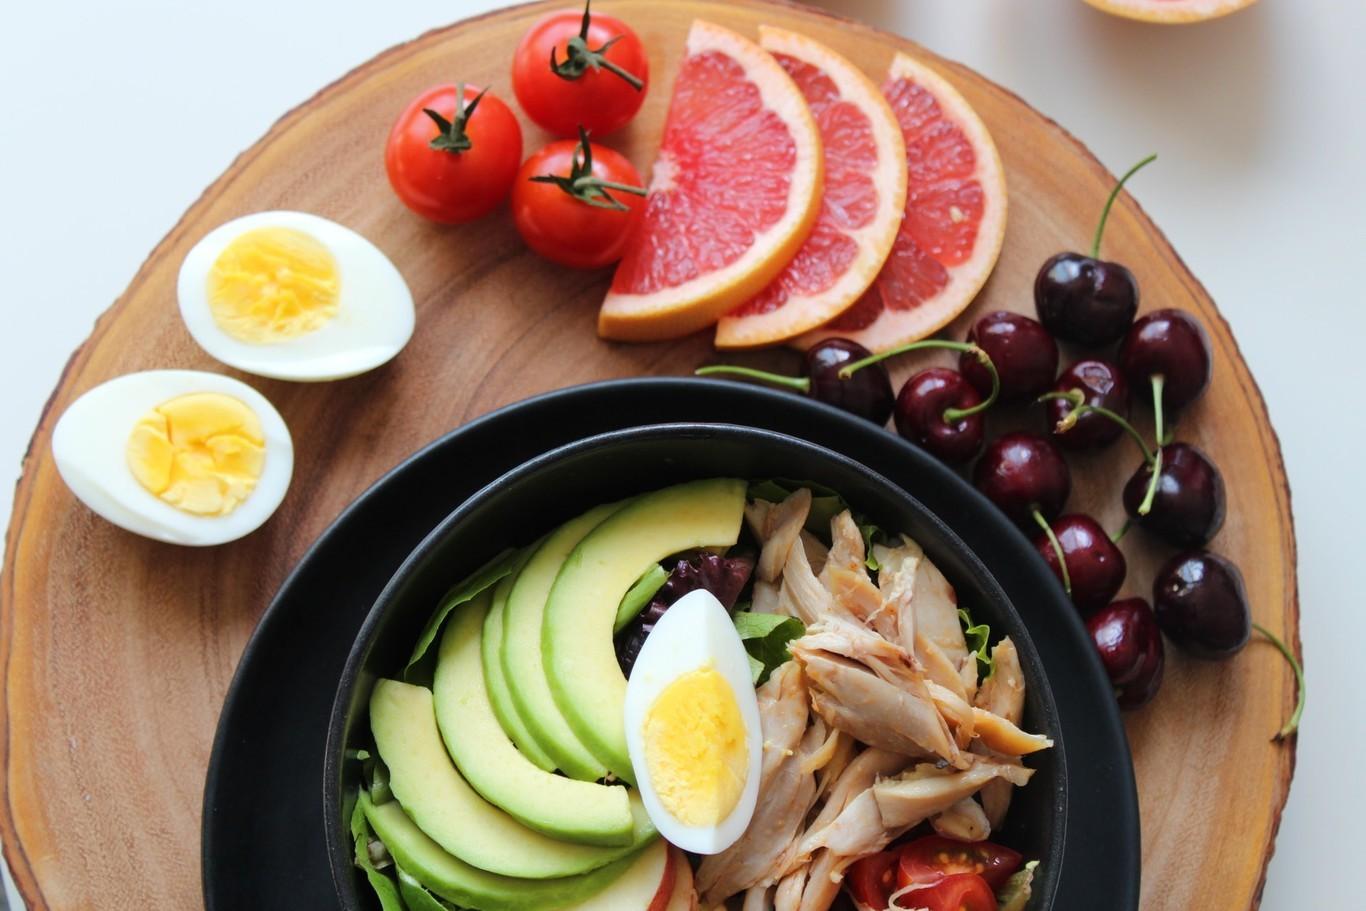 acido urico dieta recomendada al